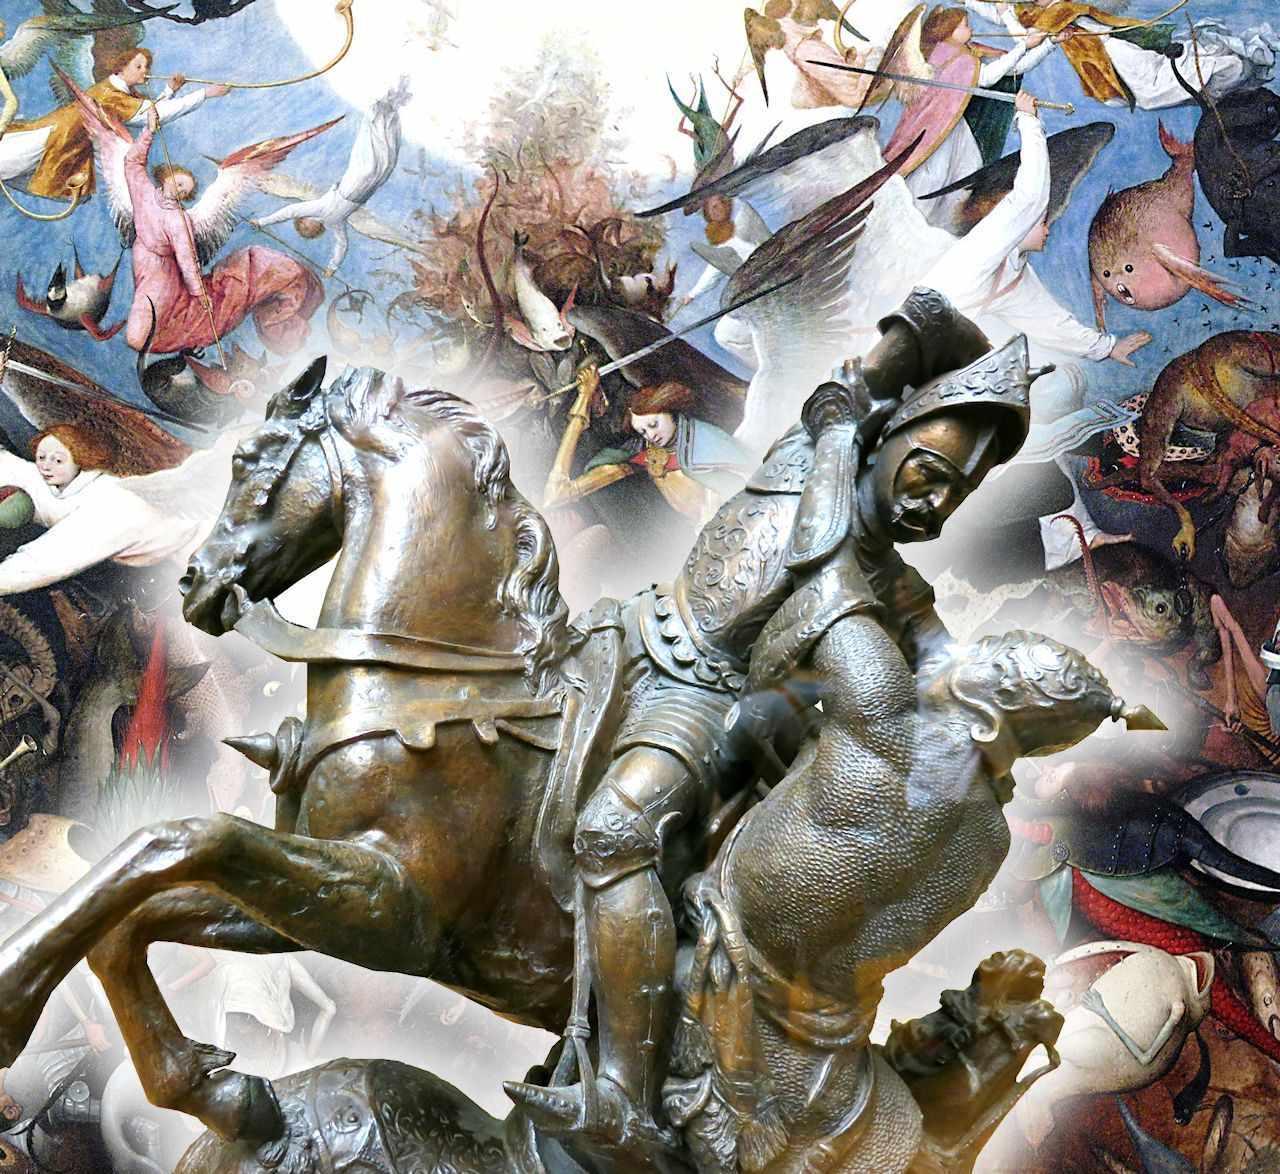 Carlos Martel na batalha de Poitiers contra os invasores islâmicos